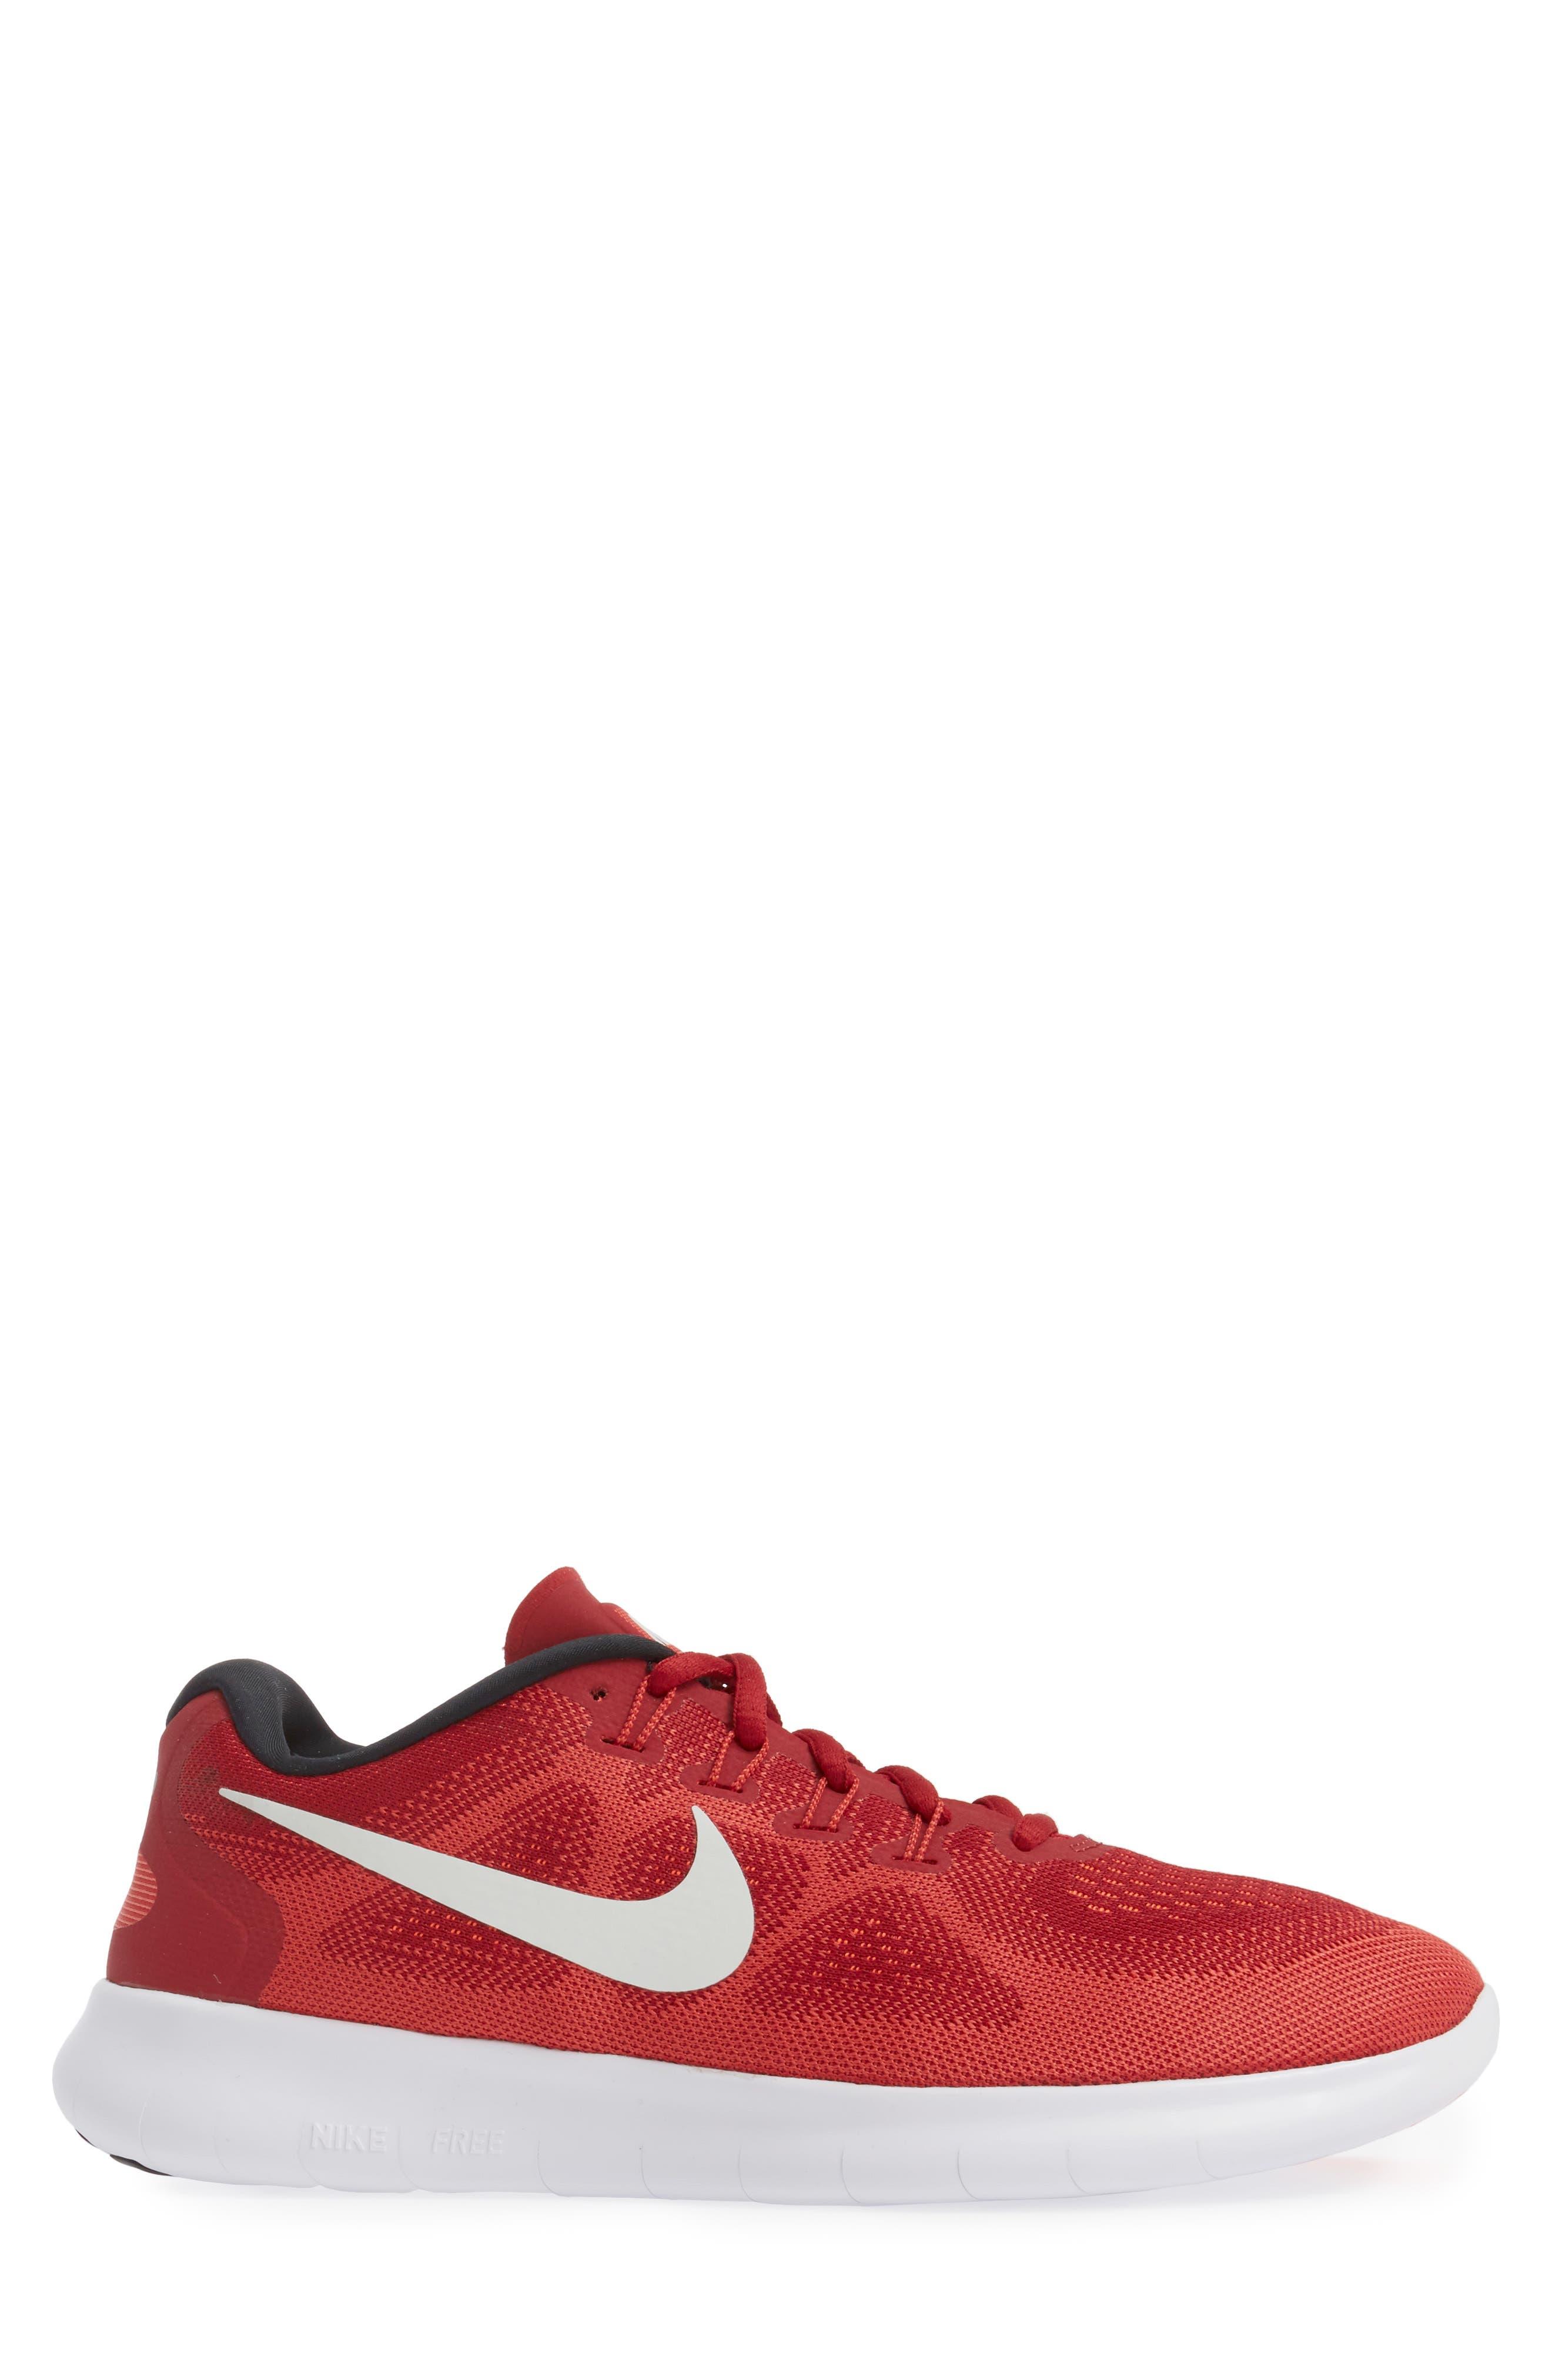 Free Run 2017 Running Shoe,                             Alternate thumbnail 39, color,